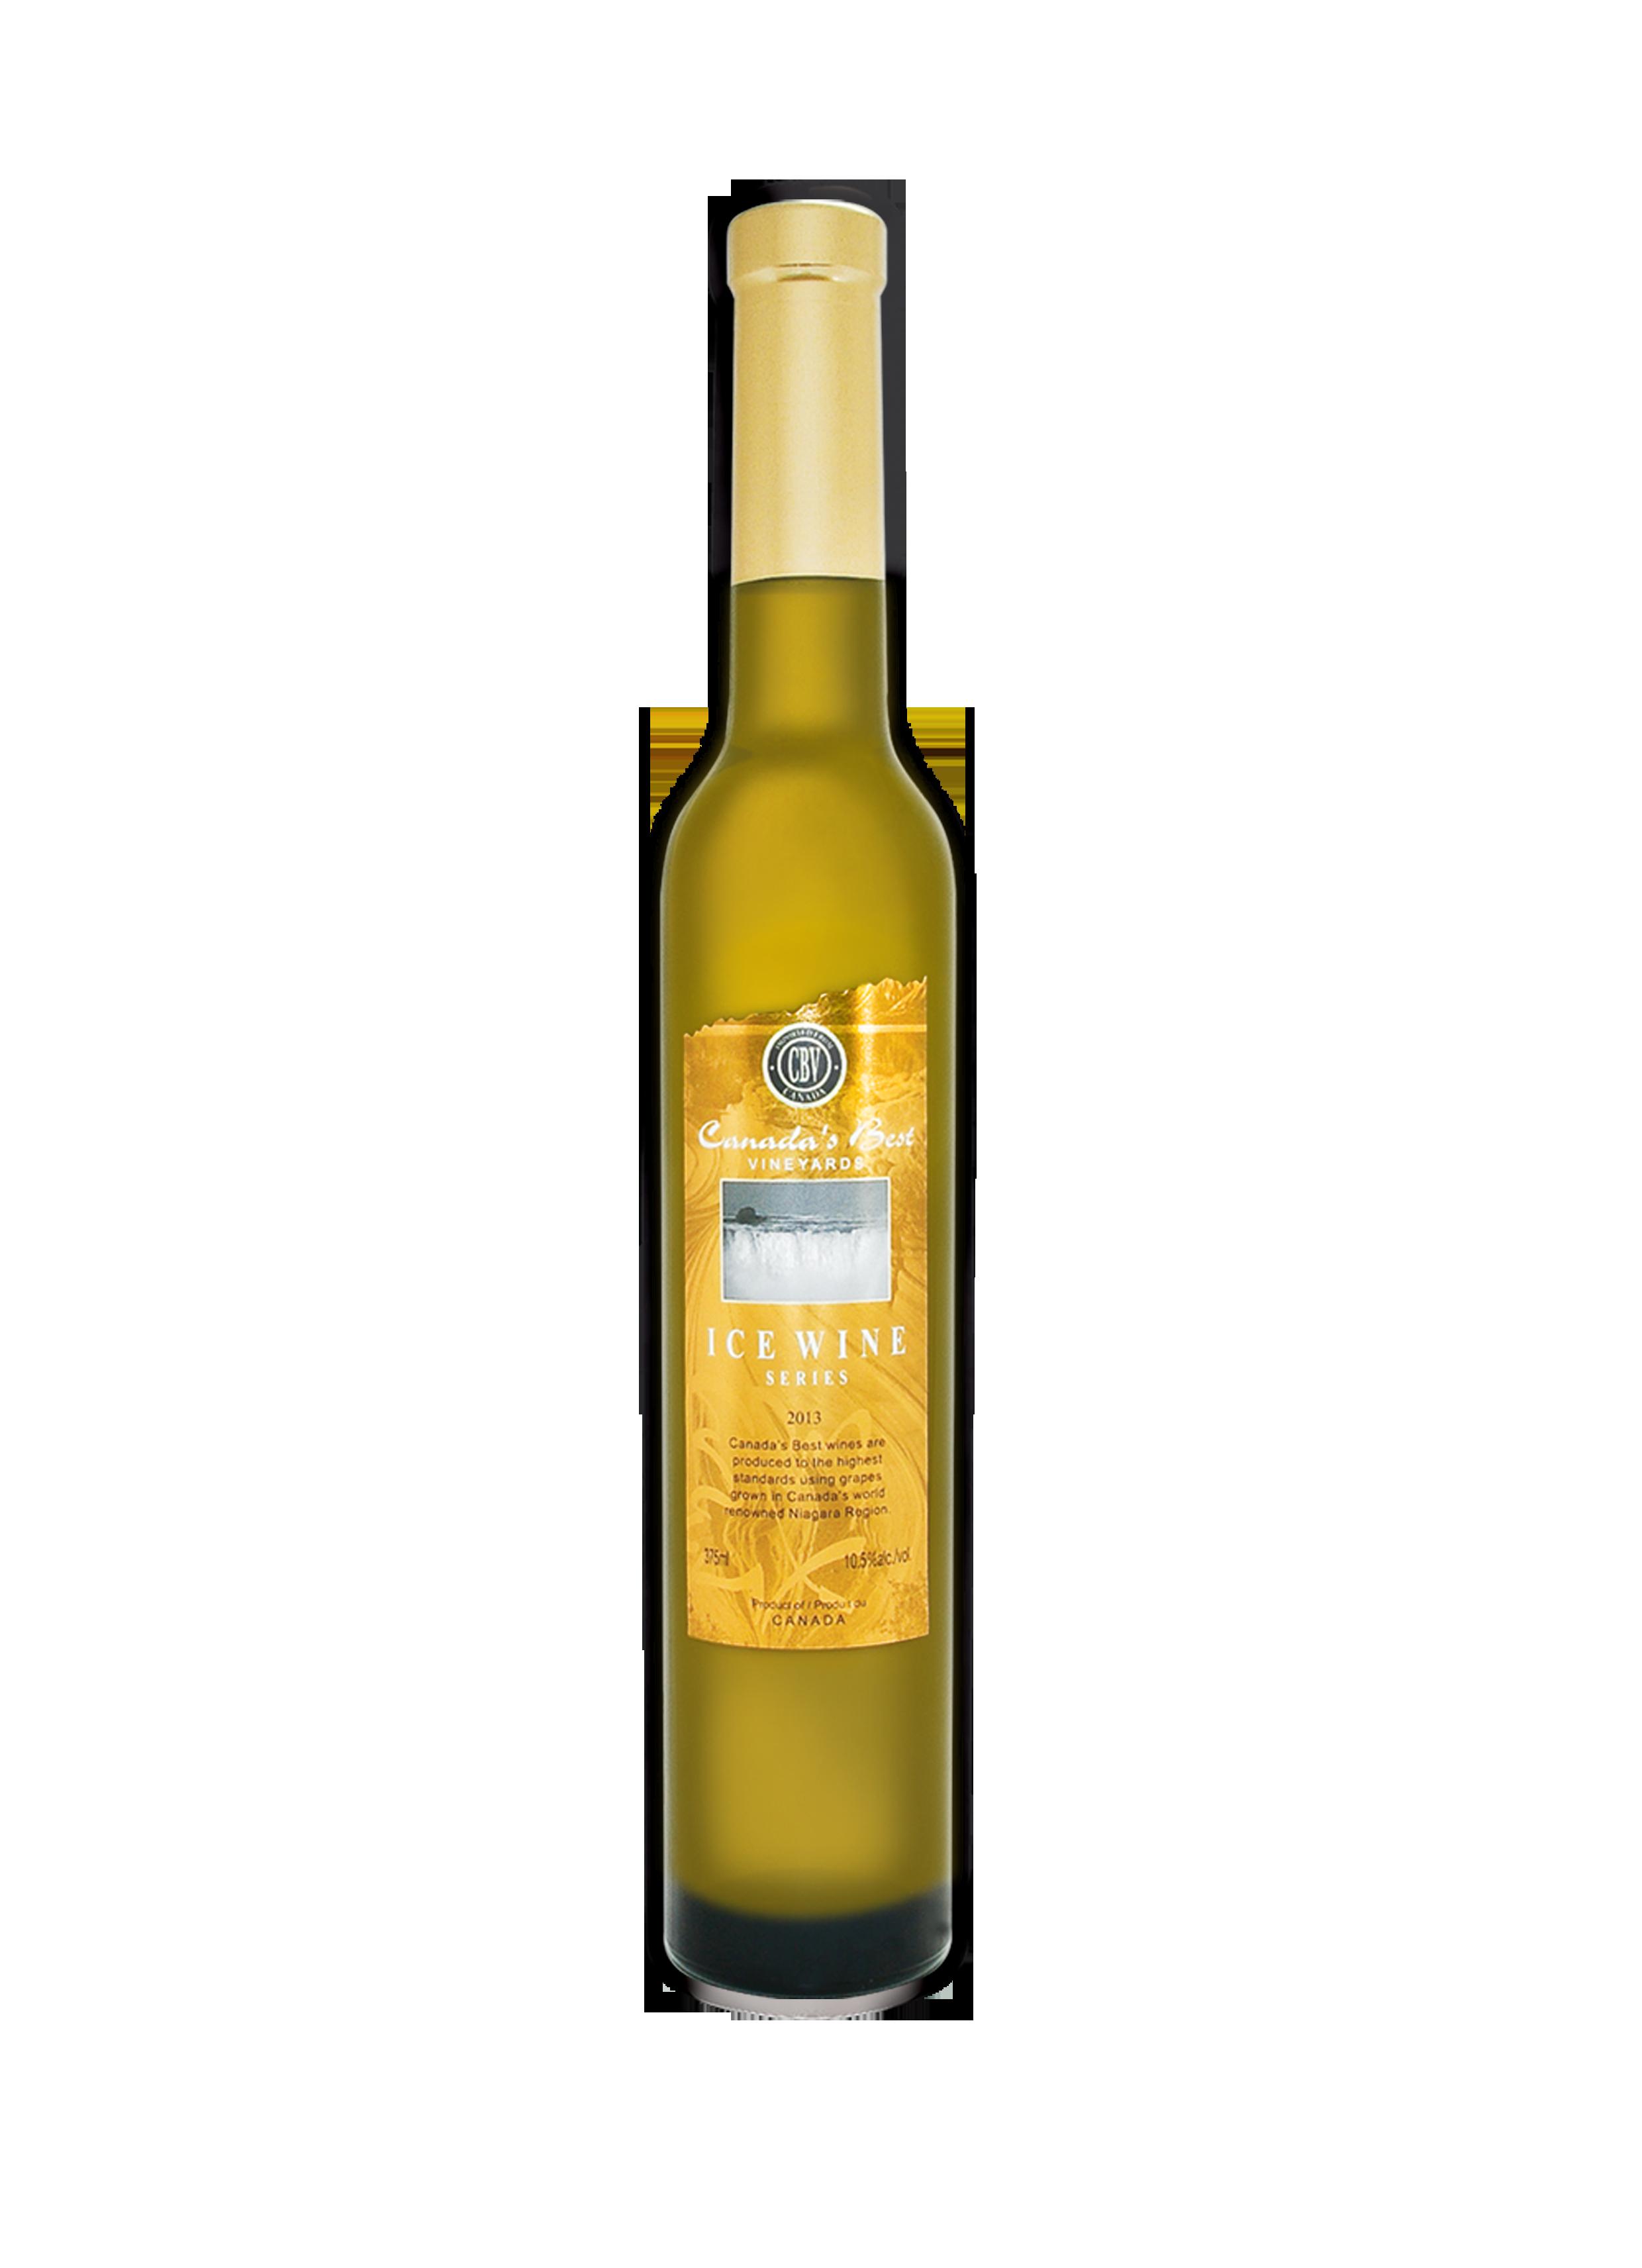 Cbv ice wine series. Drinks clipart milk powder